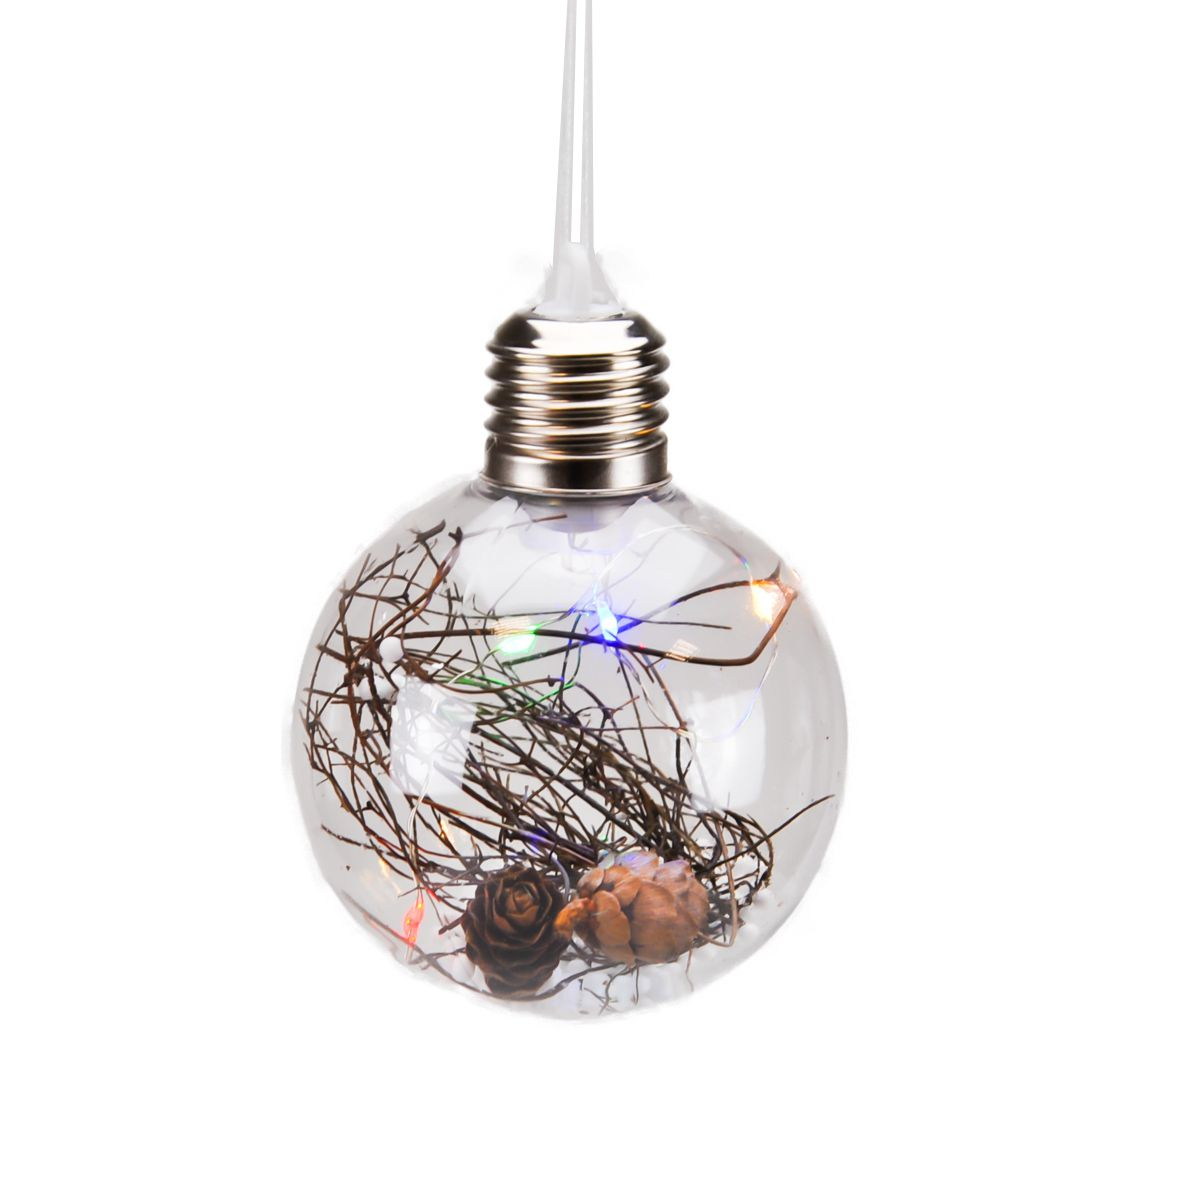 Bola de Natal Plástico 08 cm (acende)